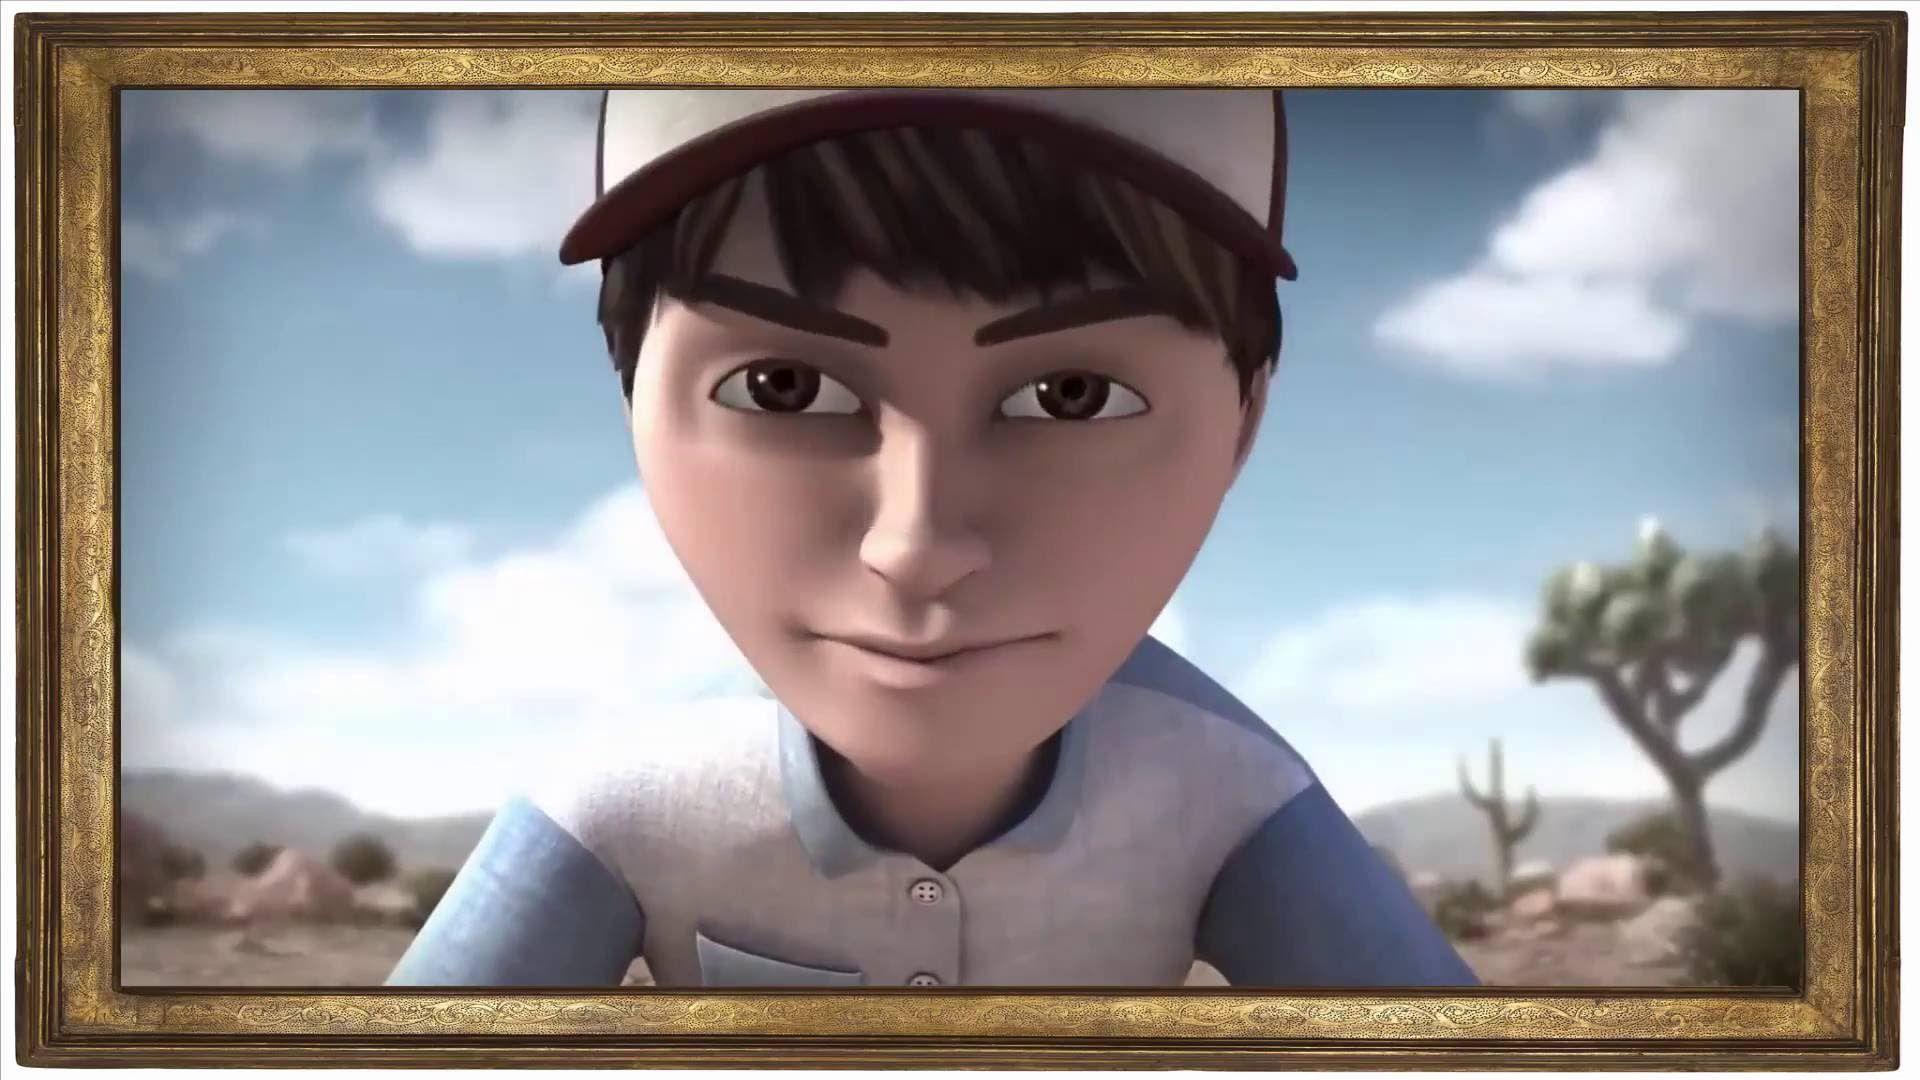 Driven HD Fantastic CGI 3D Animated Short Film | Animated Short Film 201...